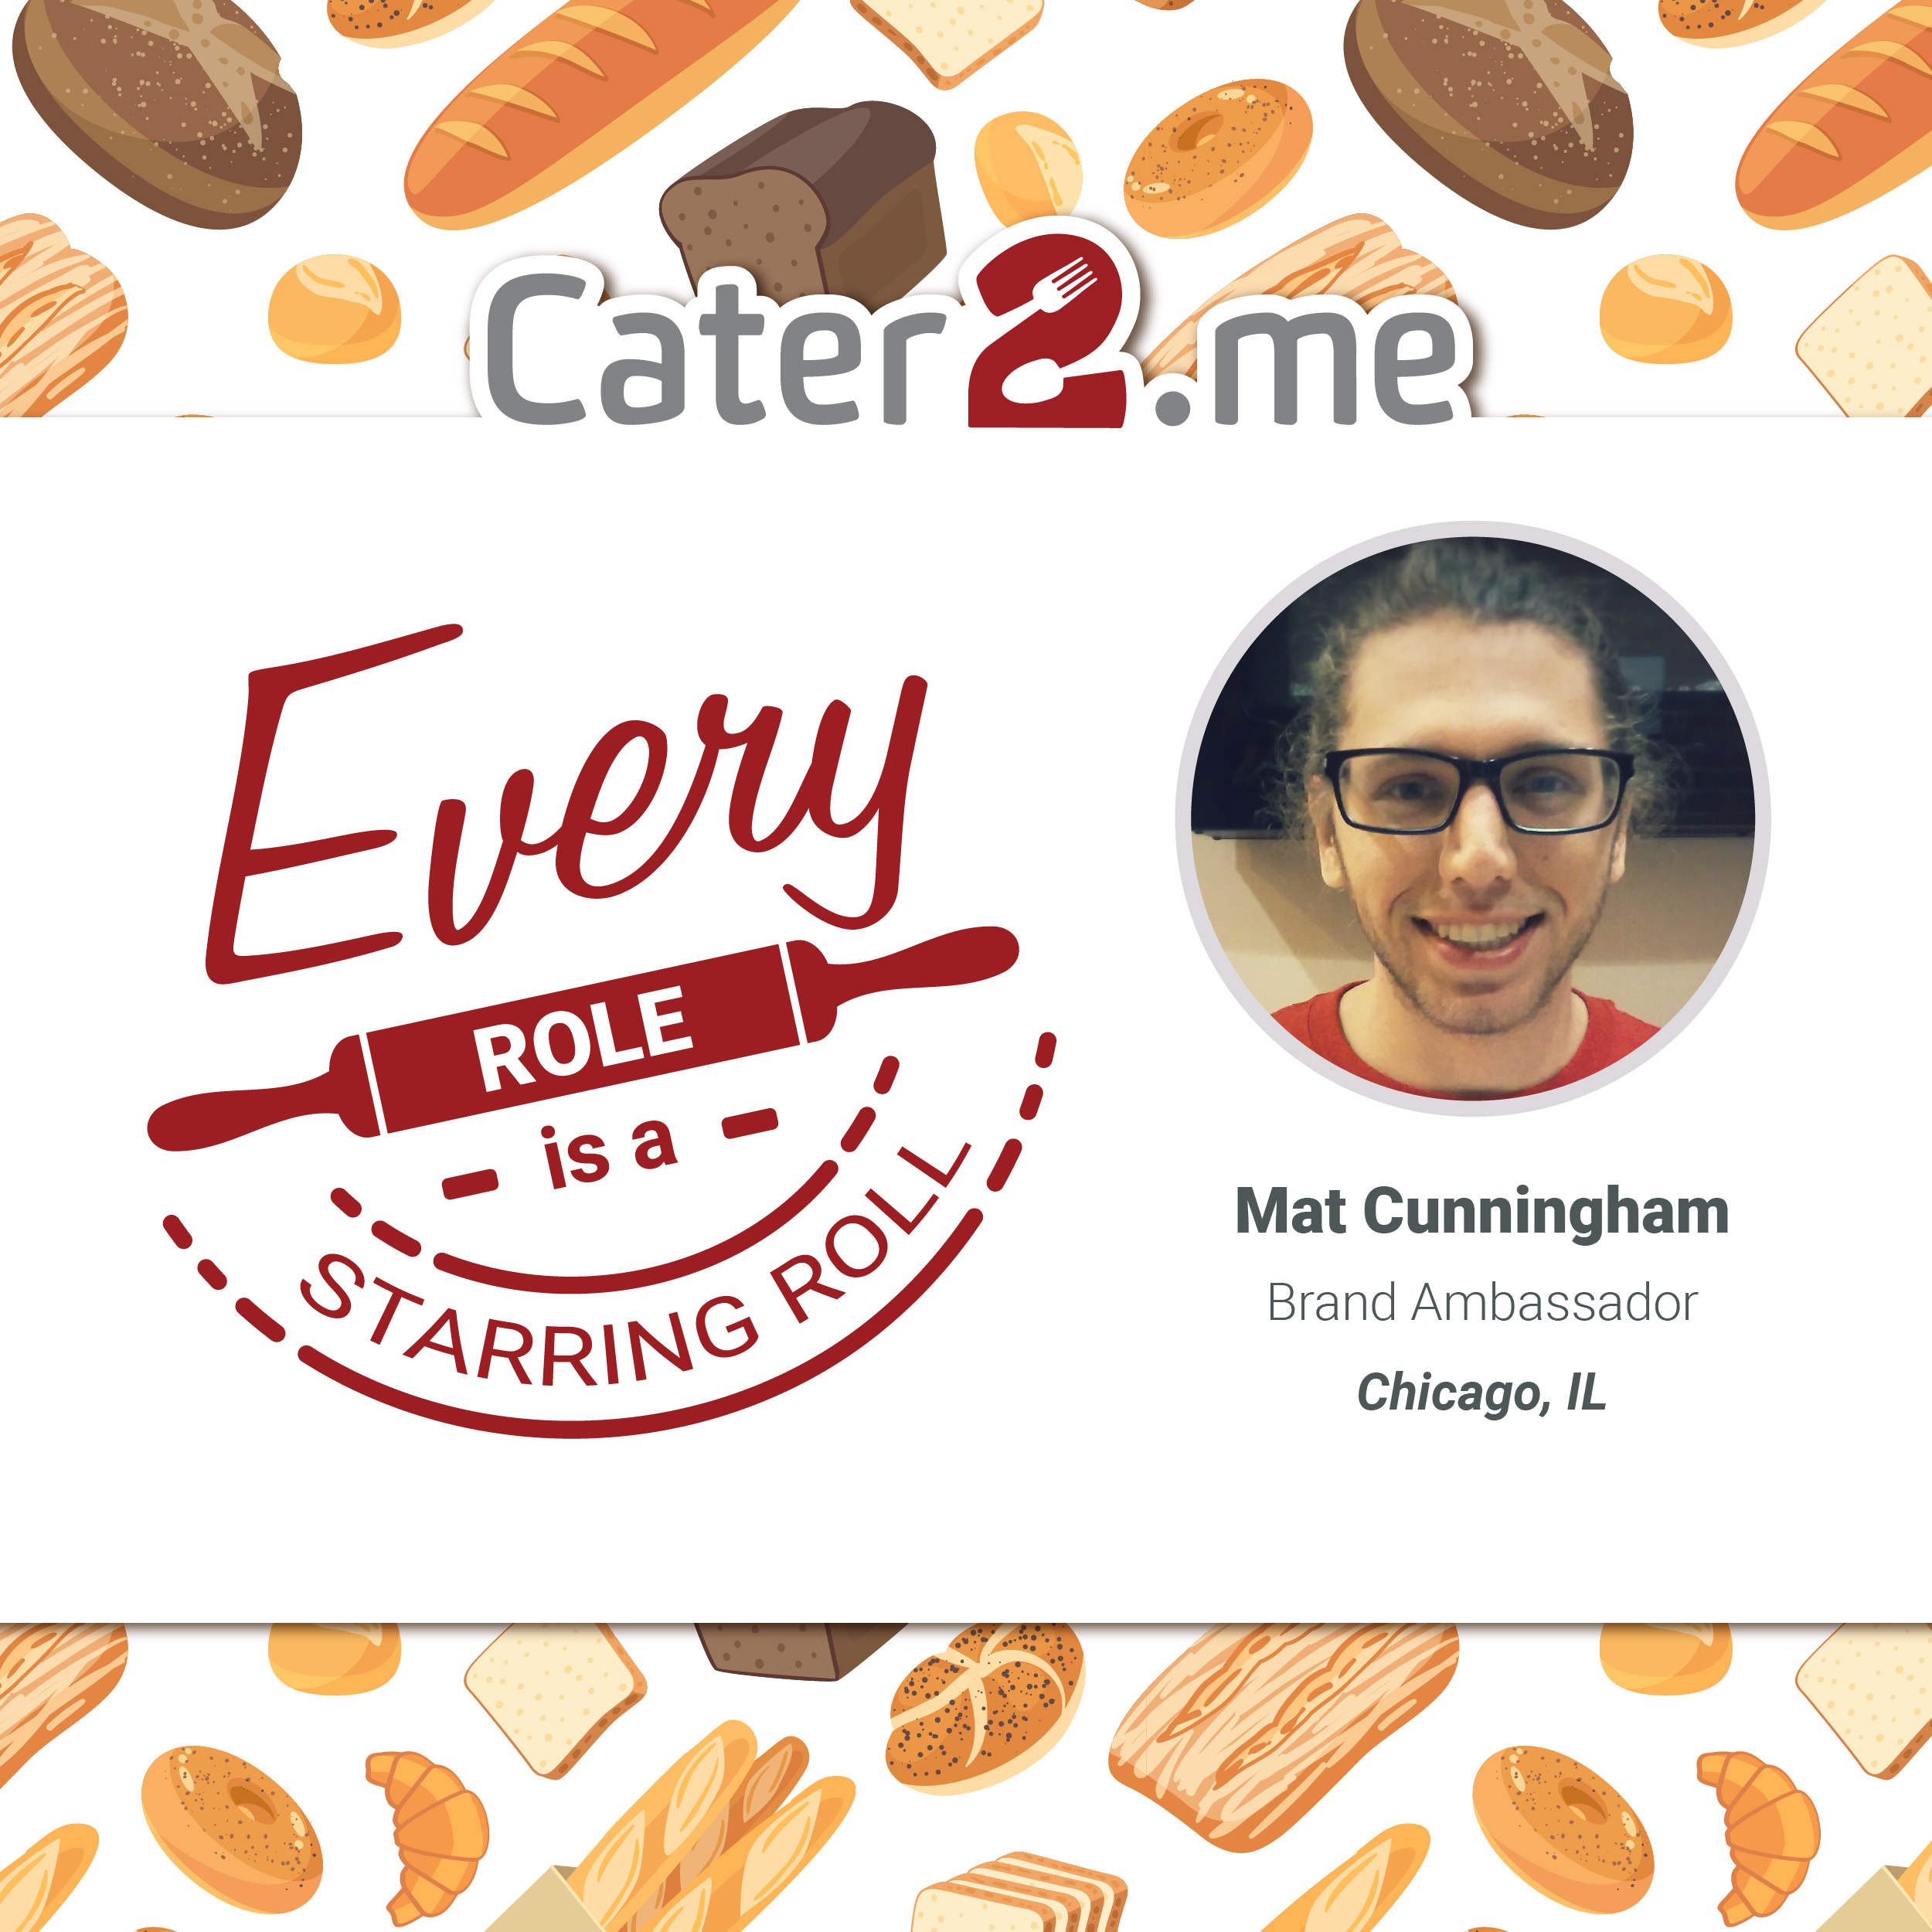 Cater2.me's Mat Cunningham